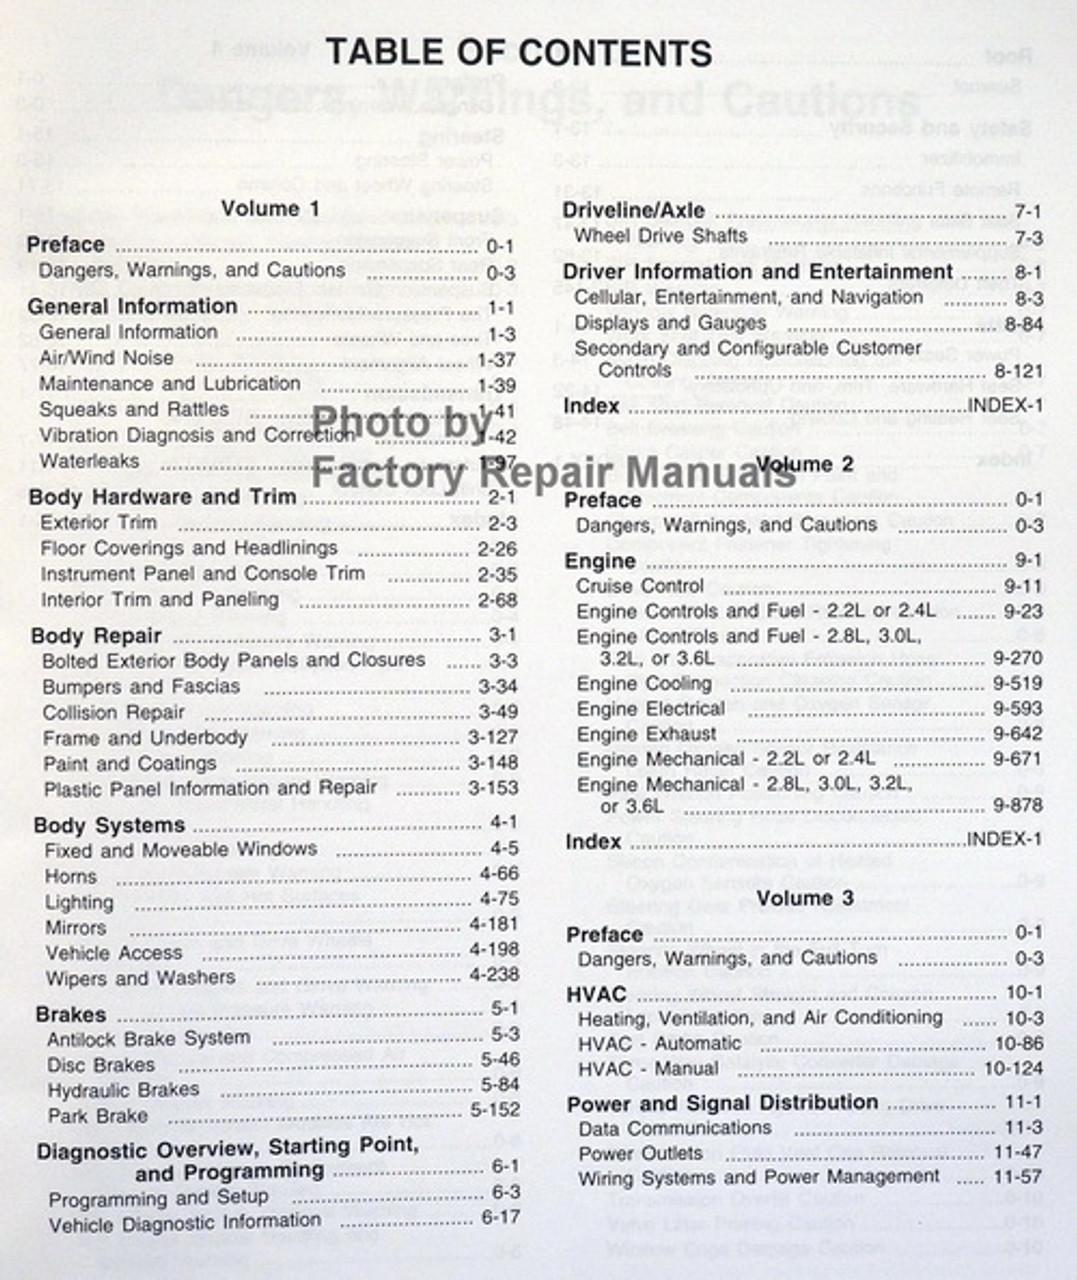 2011 Chevy Malibu Factory Service Manual Set Original Shop Repair